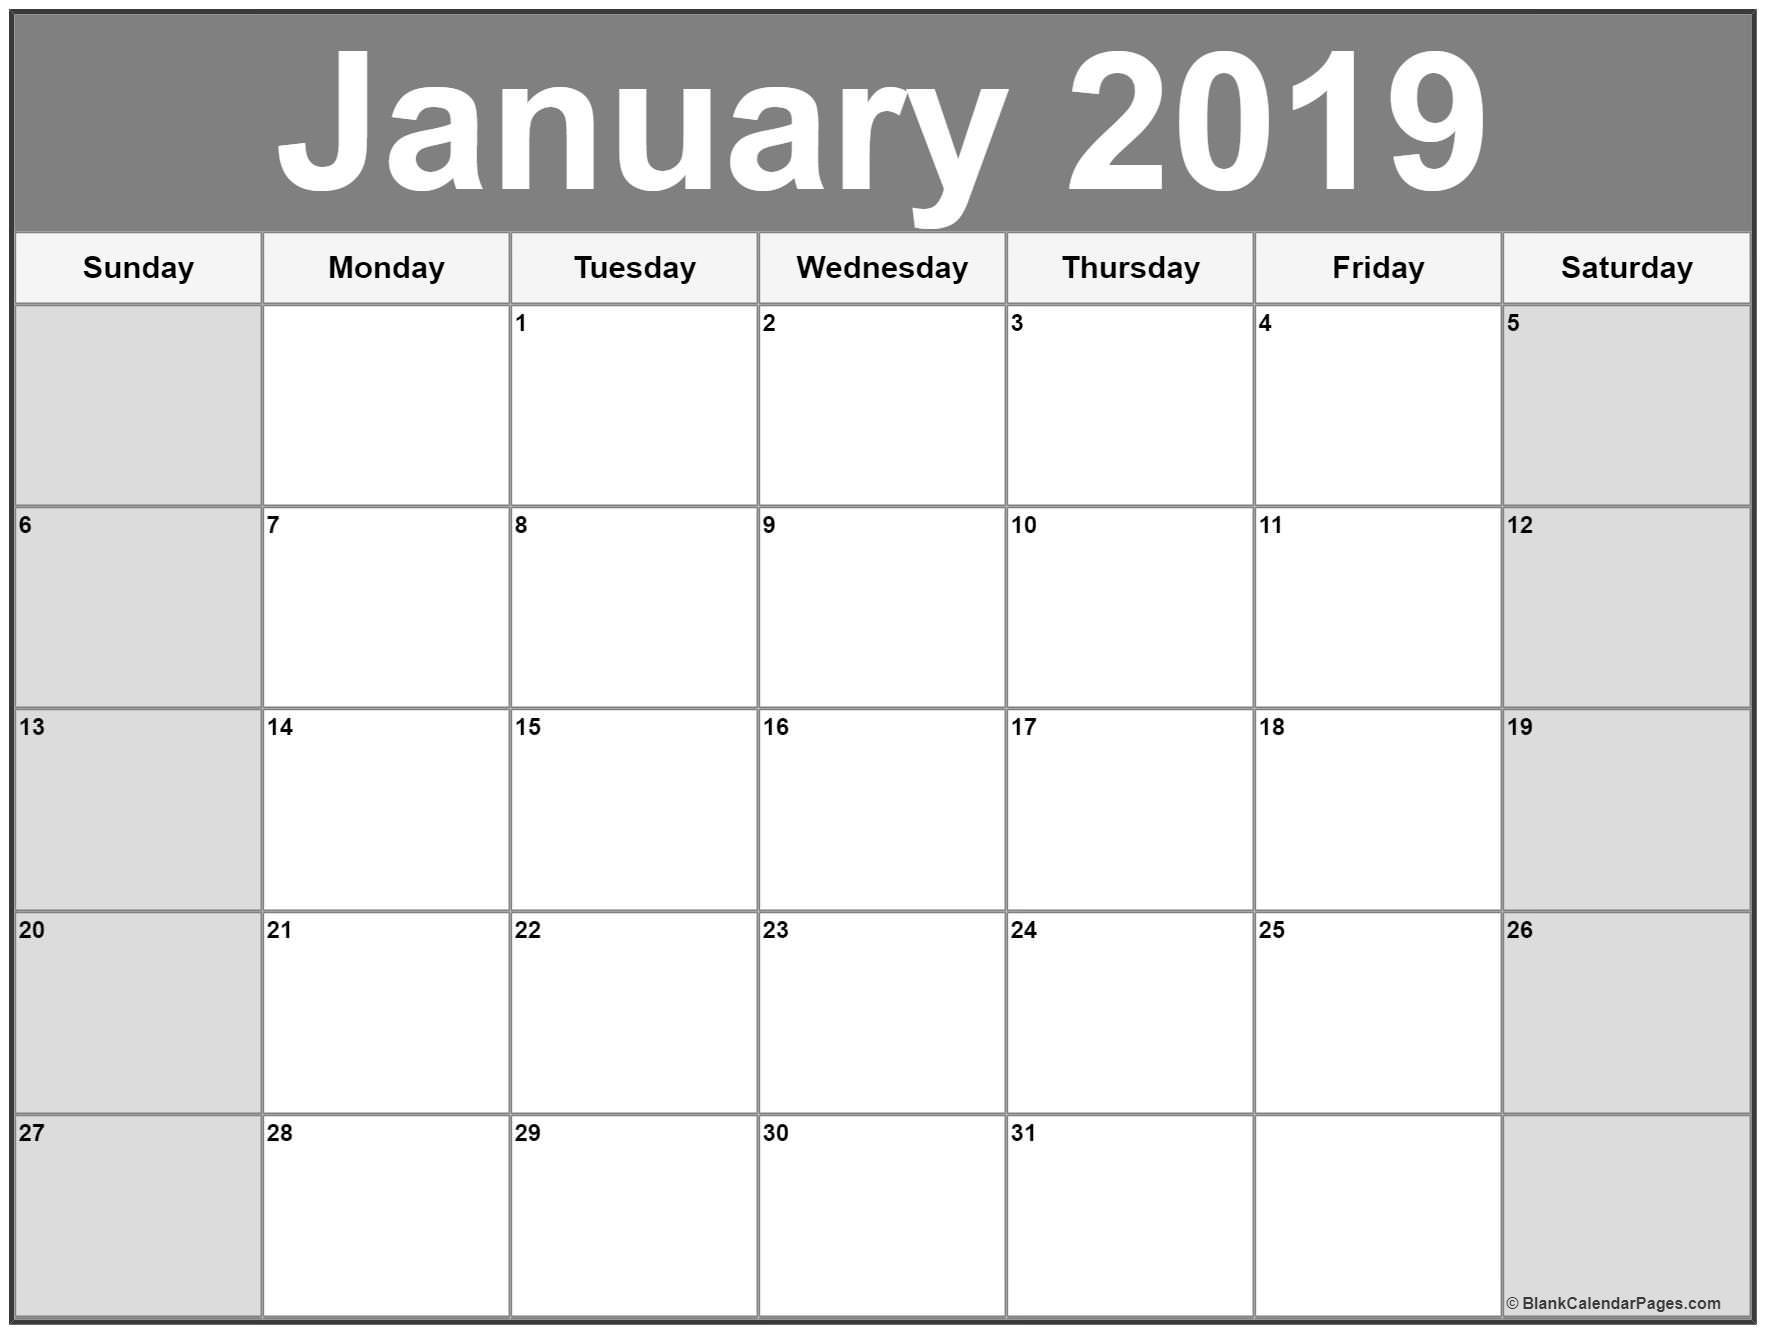 January 2019 Printable Calendar Free January 2019 Calendar